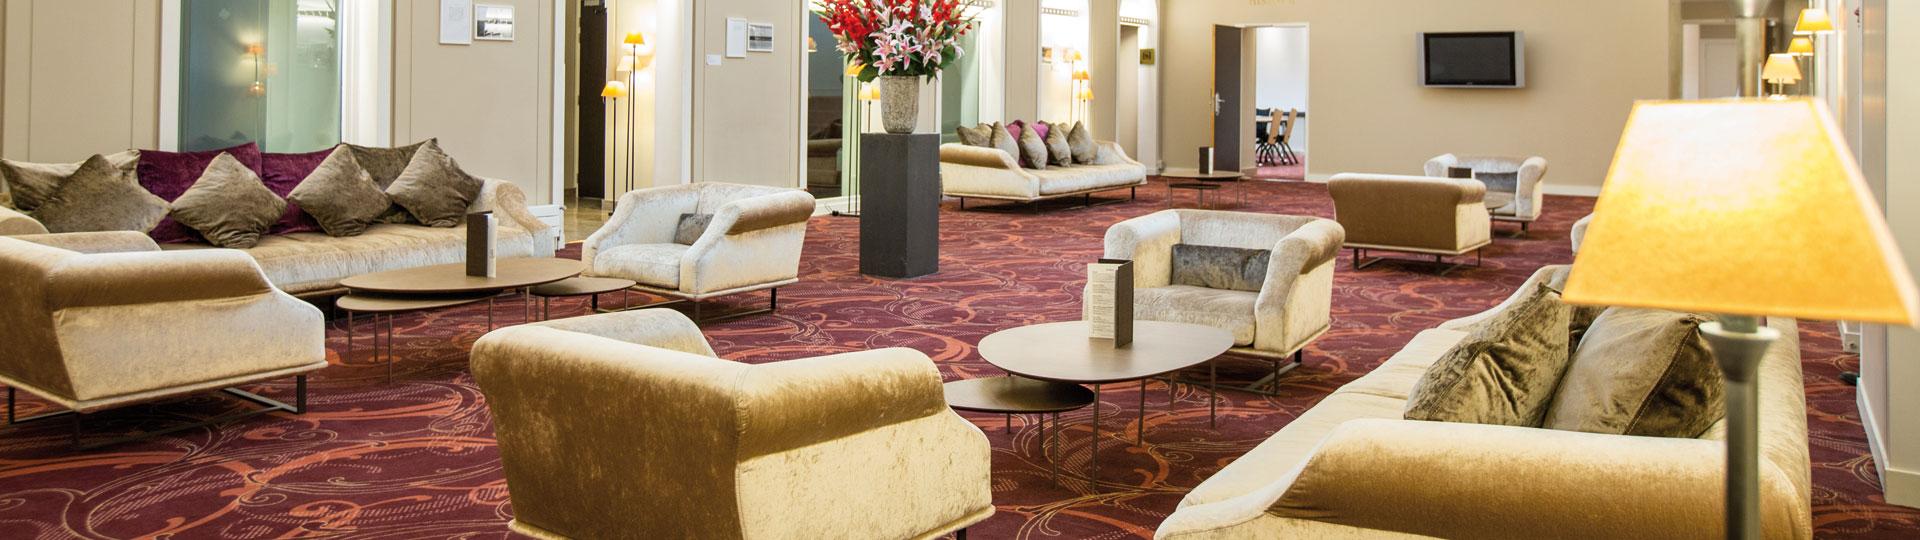 salons - provinces opéra hôtel